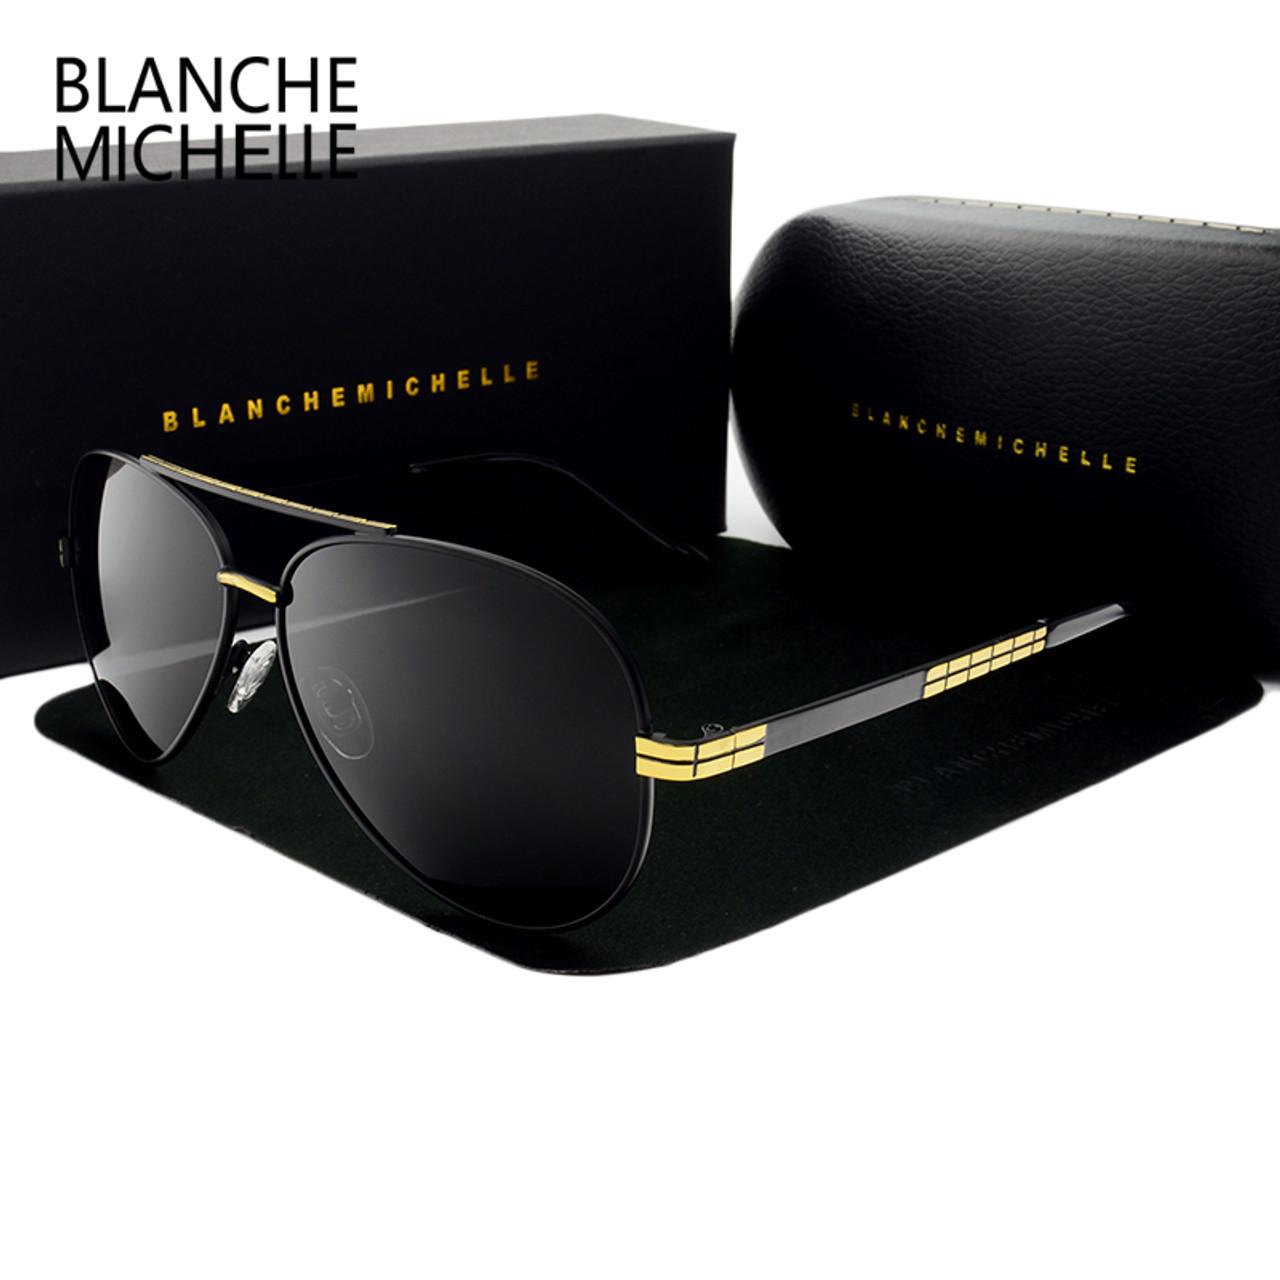 bcca0e0dfb4 2017 High quality New Pilot sunglasses men Polarized luxury brand vintage  Mens Sun glasses Driving UV400 Sunglass With Box - OnshopDeals.Com